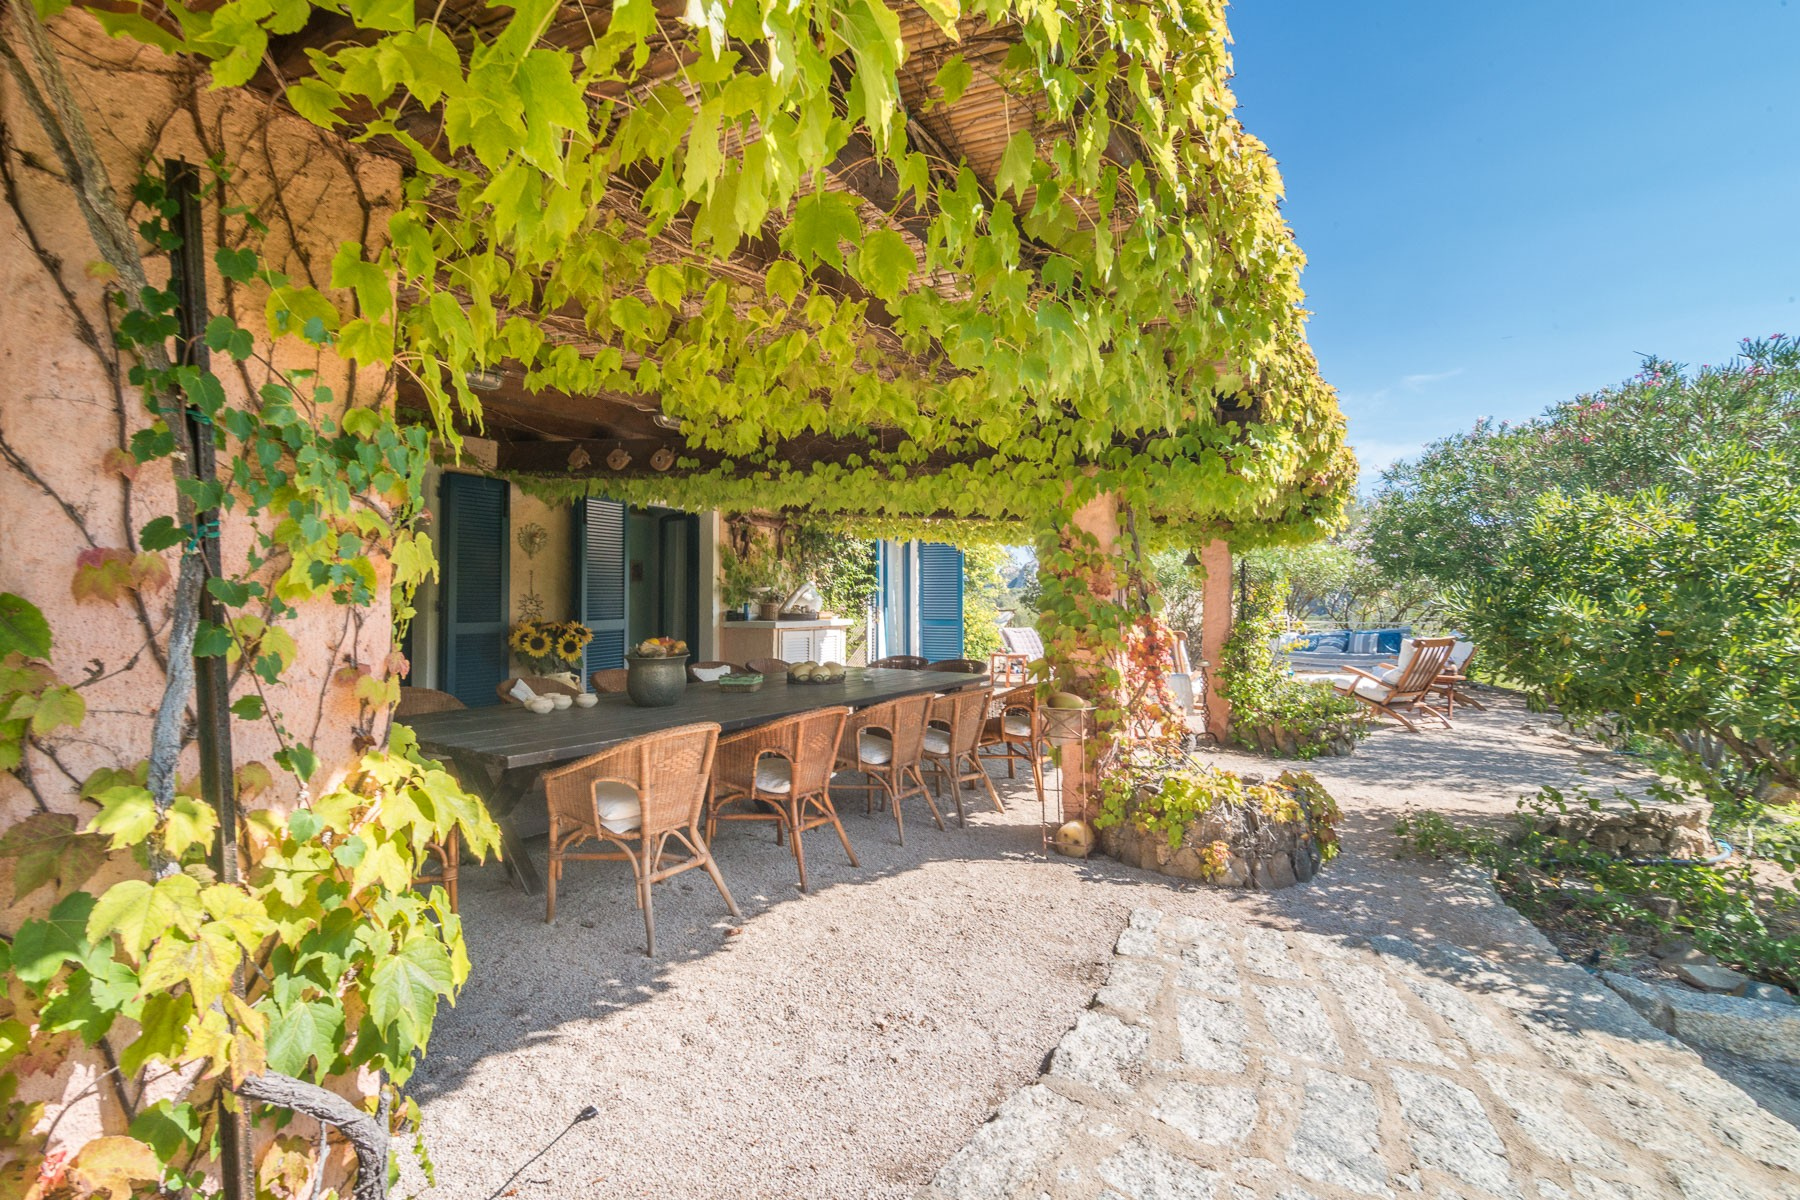 Casa indipendente in Vendita a Olbia:  5 locali, 230 mq  - Foto 1